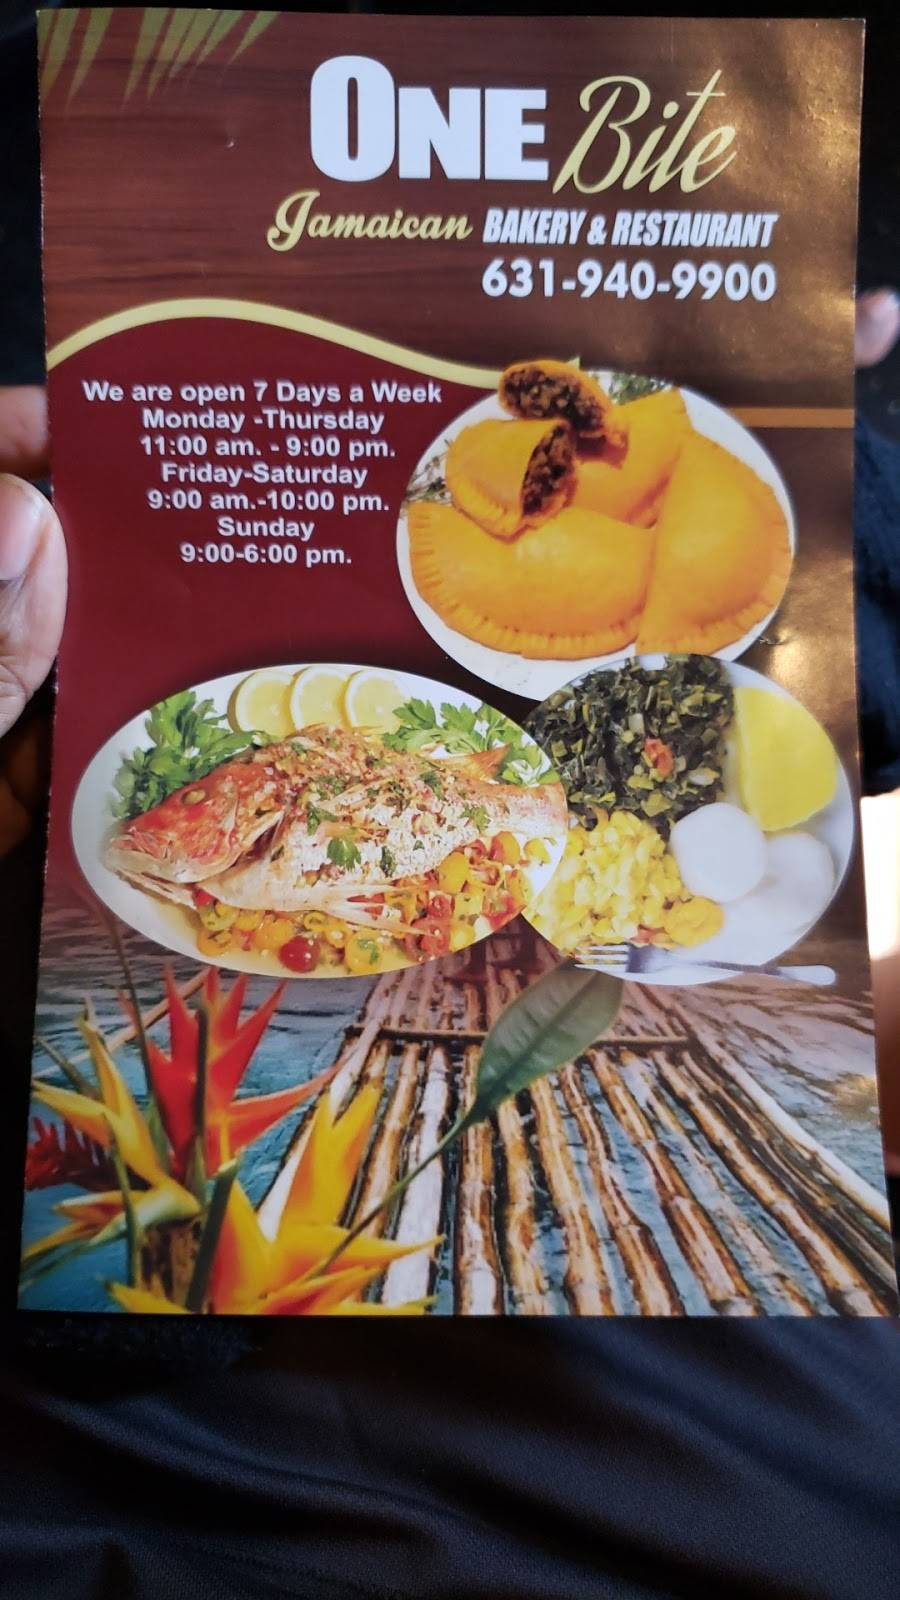 One Bite | restaurant | 175 Bay Shore Rd, Deer Park, NY 11729, USA | 6319409900 OR +1 631-940-9900